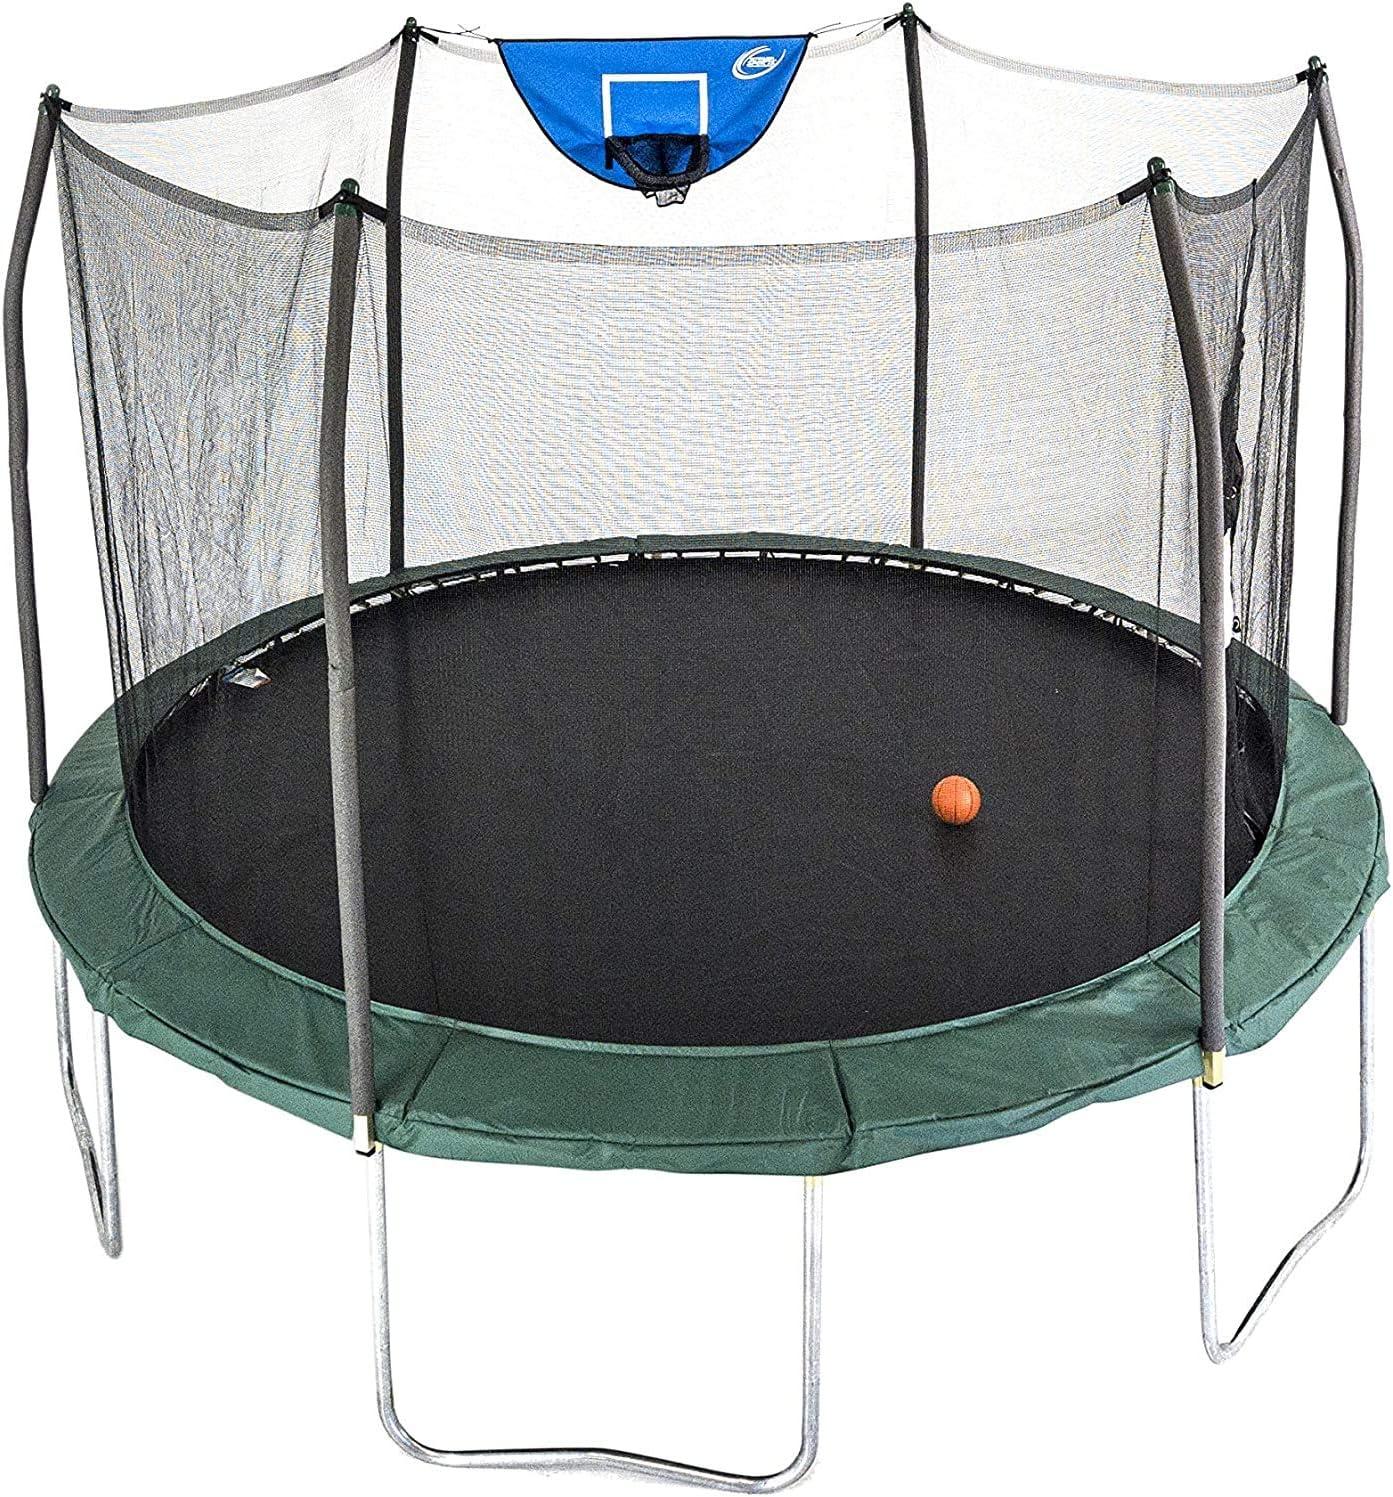 Skywalker brand trampoline